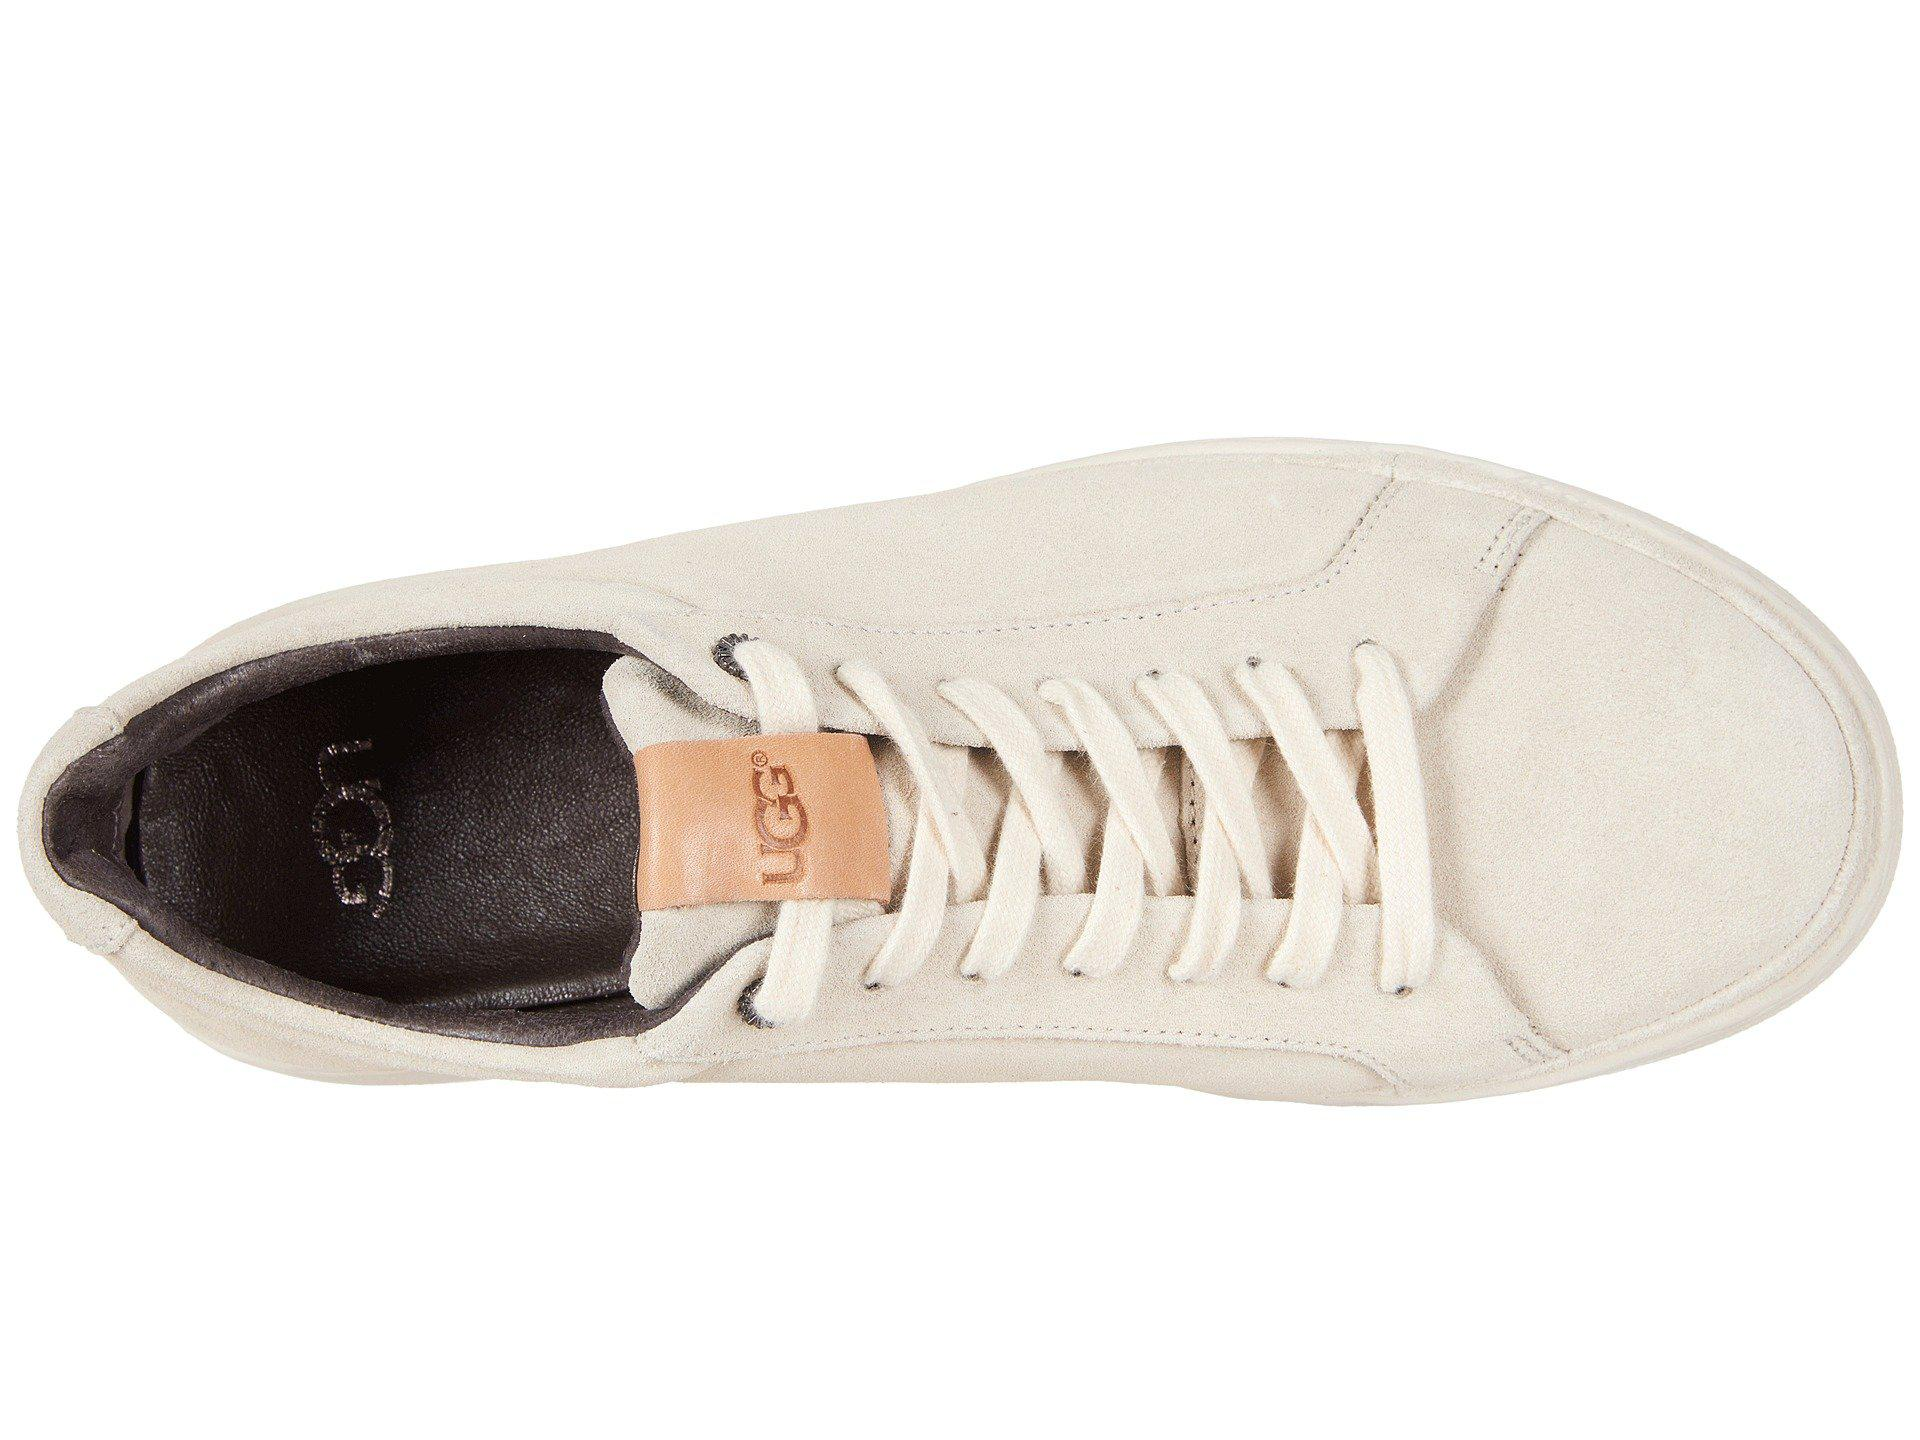 95512a45968 Ugg White Cali Sneaker Low (antilope) Men's Shoes for men